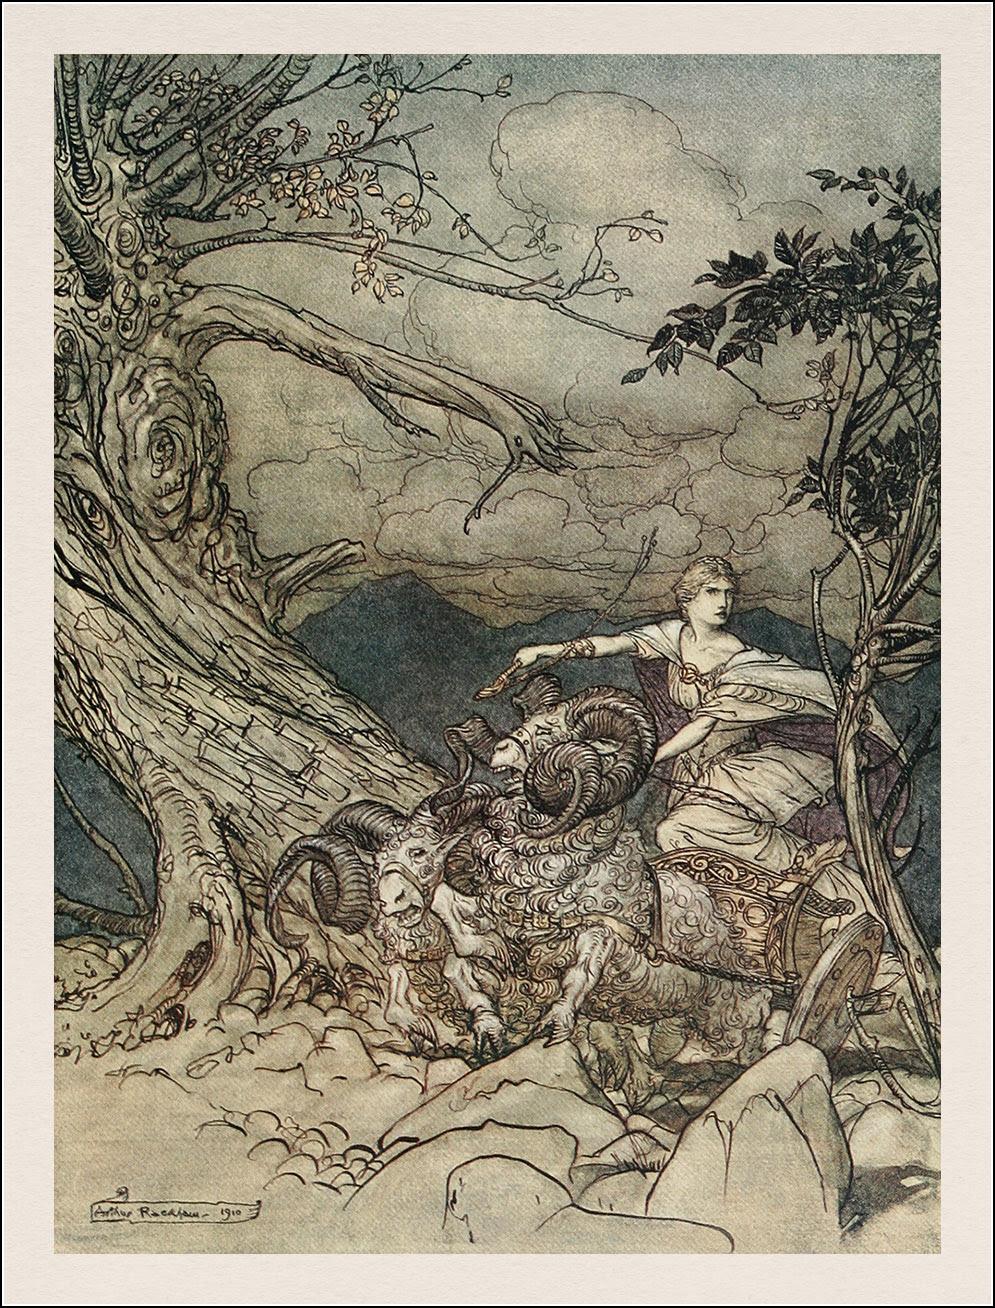 Arthur Rackham. The Rhinegold & the Valkyrie